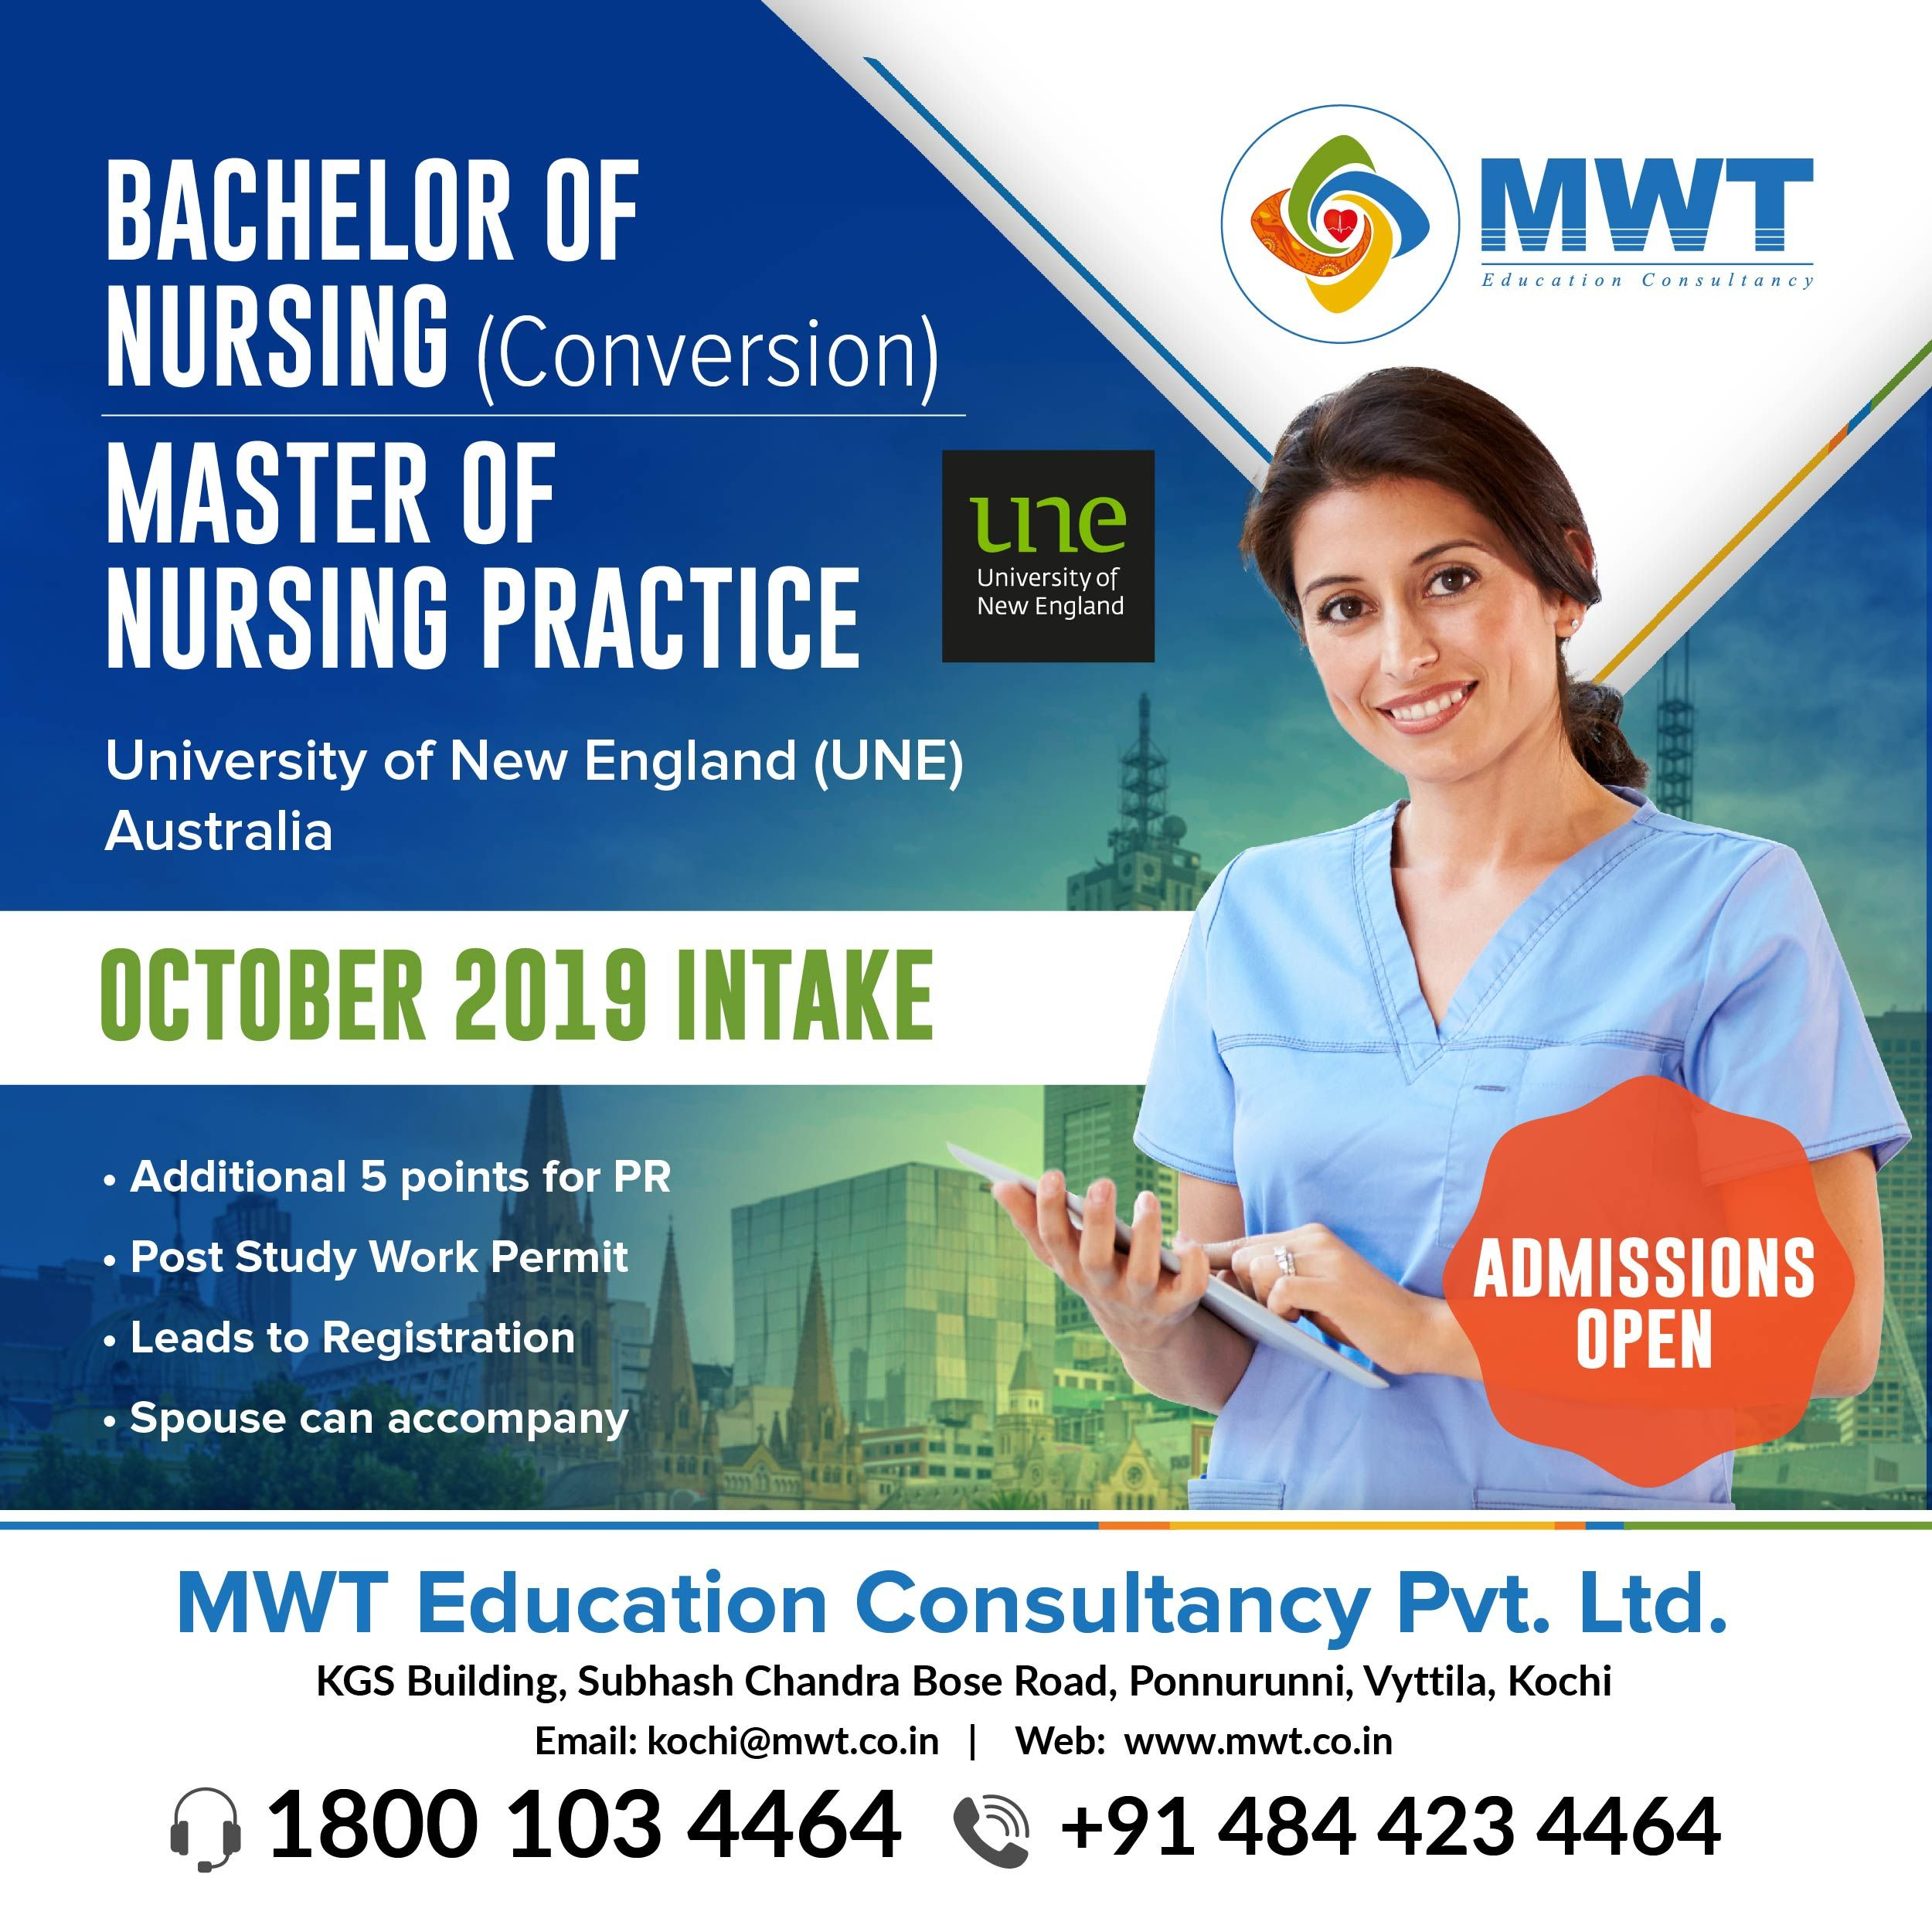 Une nursing programs overseas education bachelor